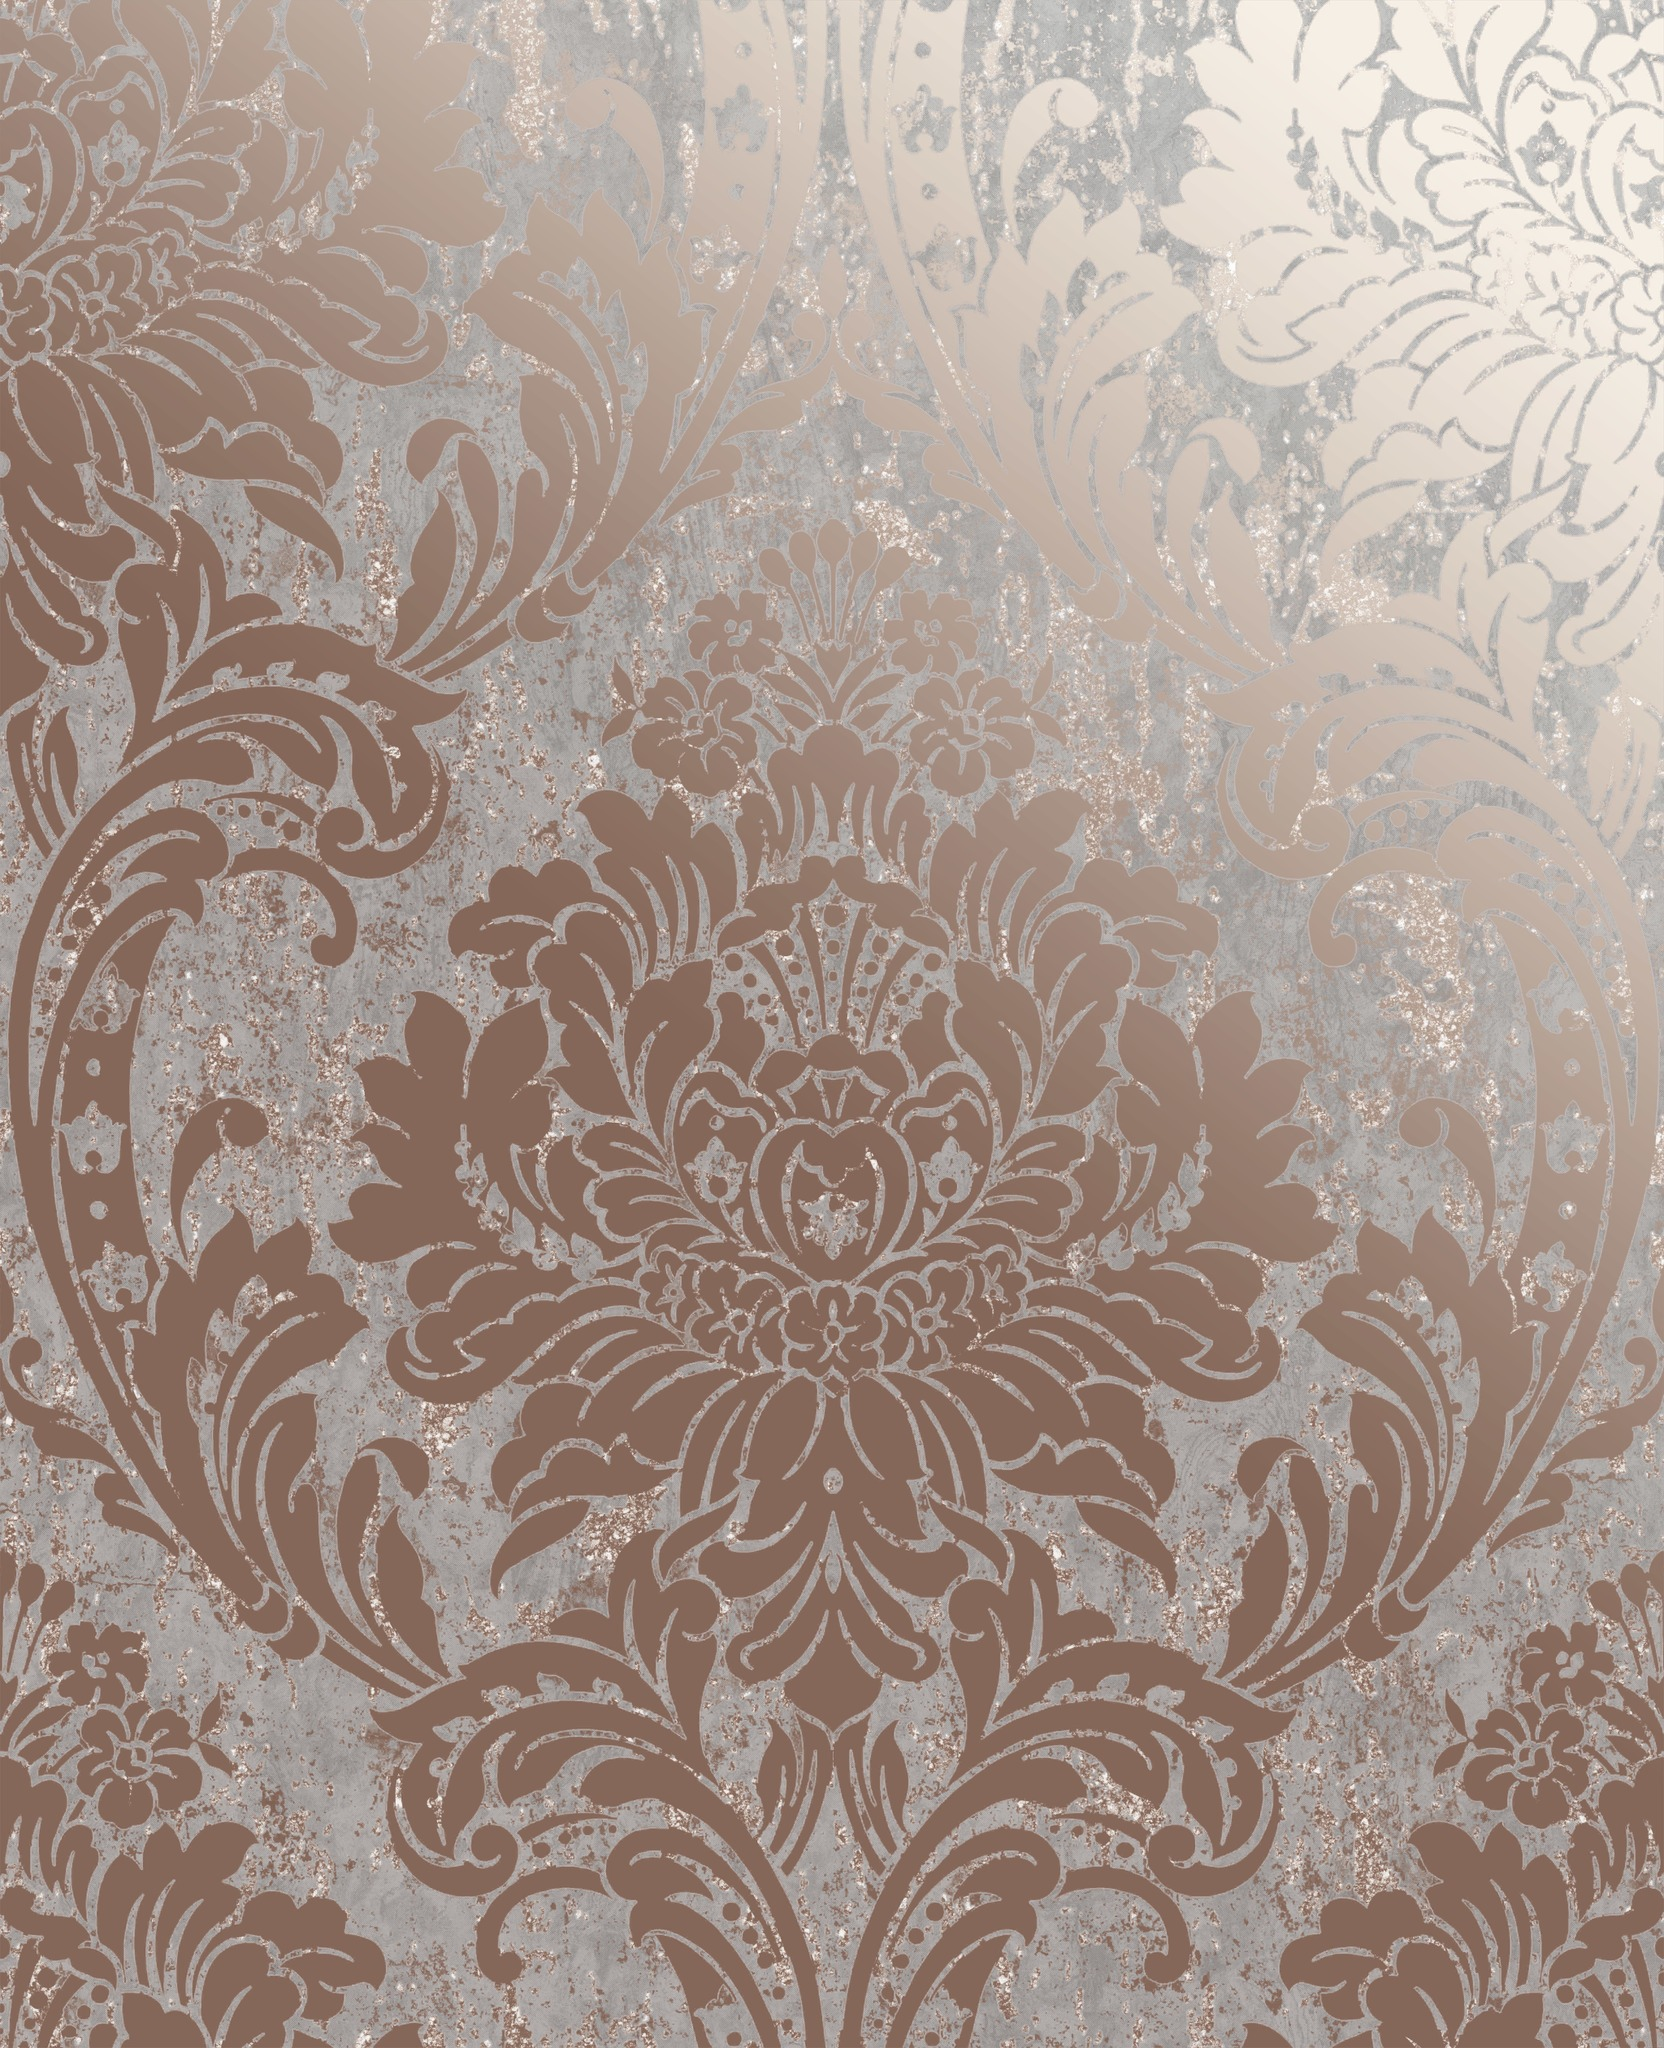 Rose Gold Distressed Damask Wallpaper Wallpaper Sales